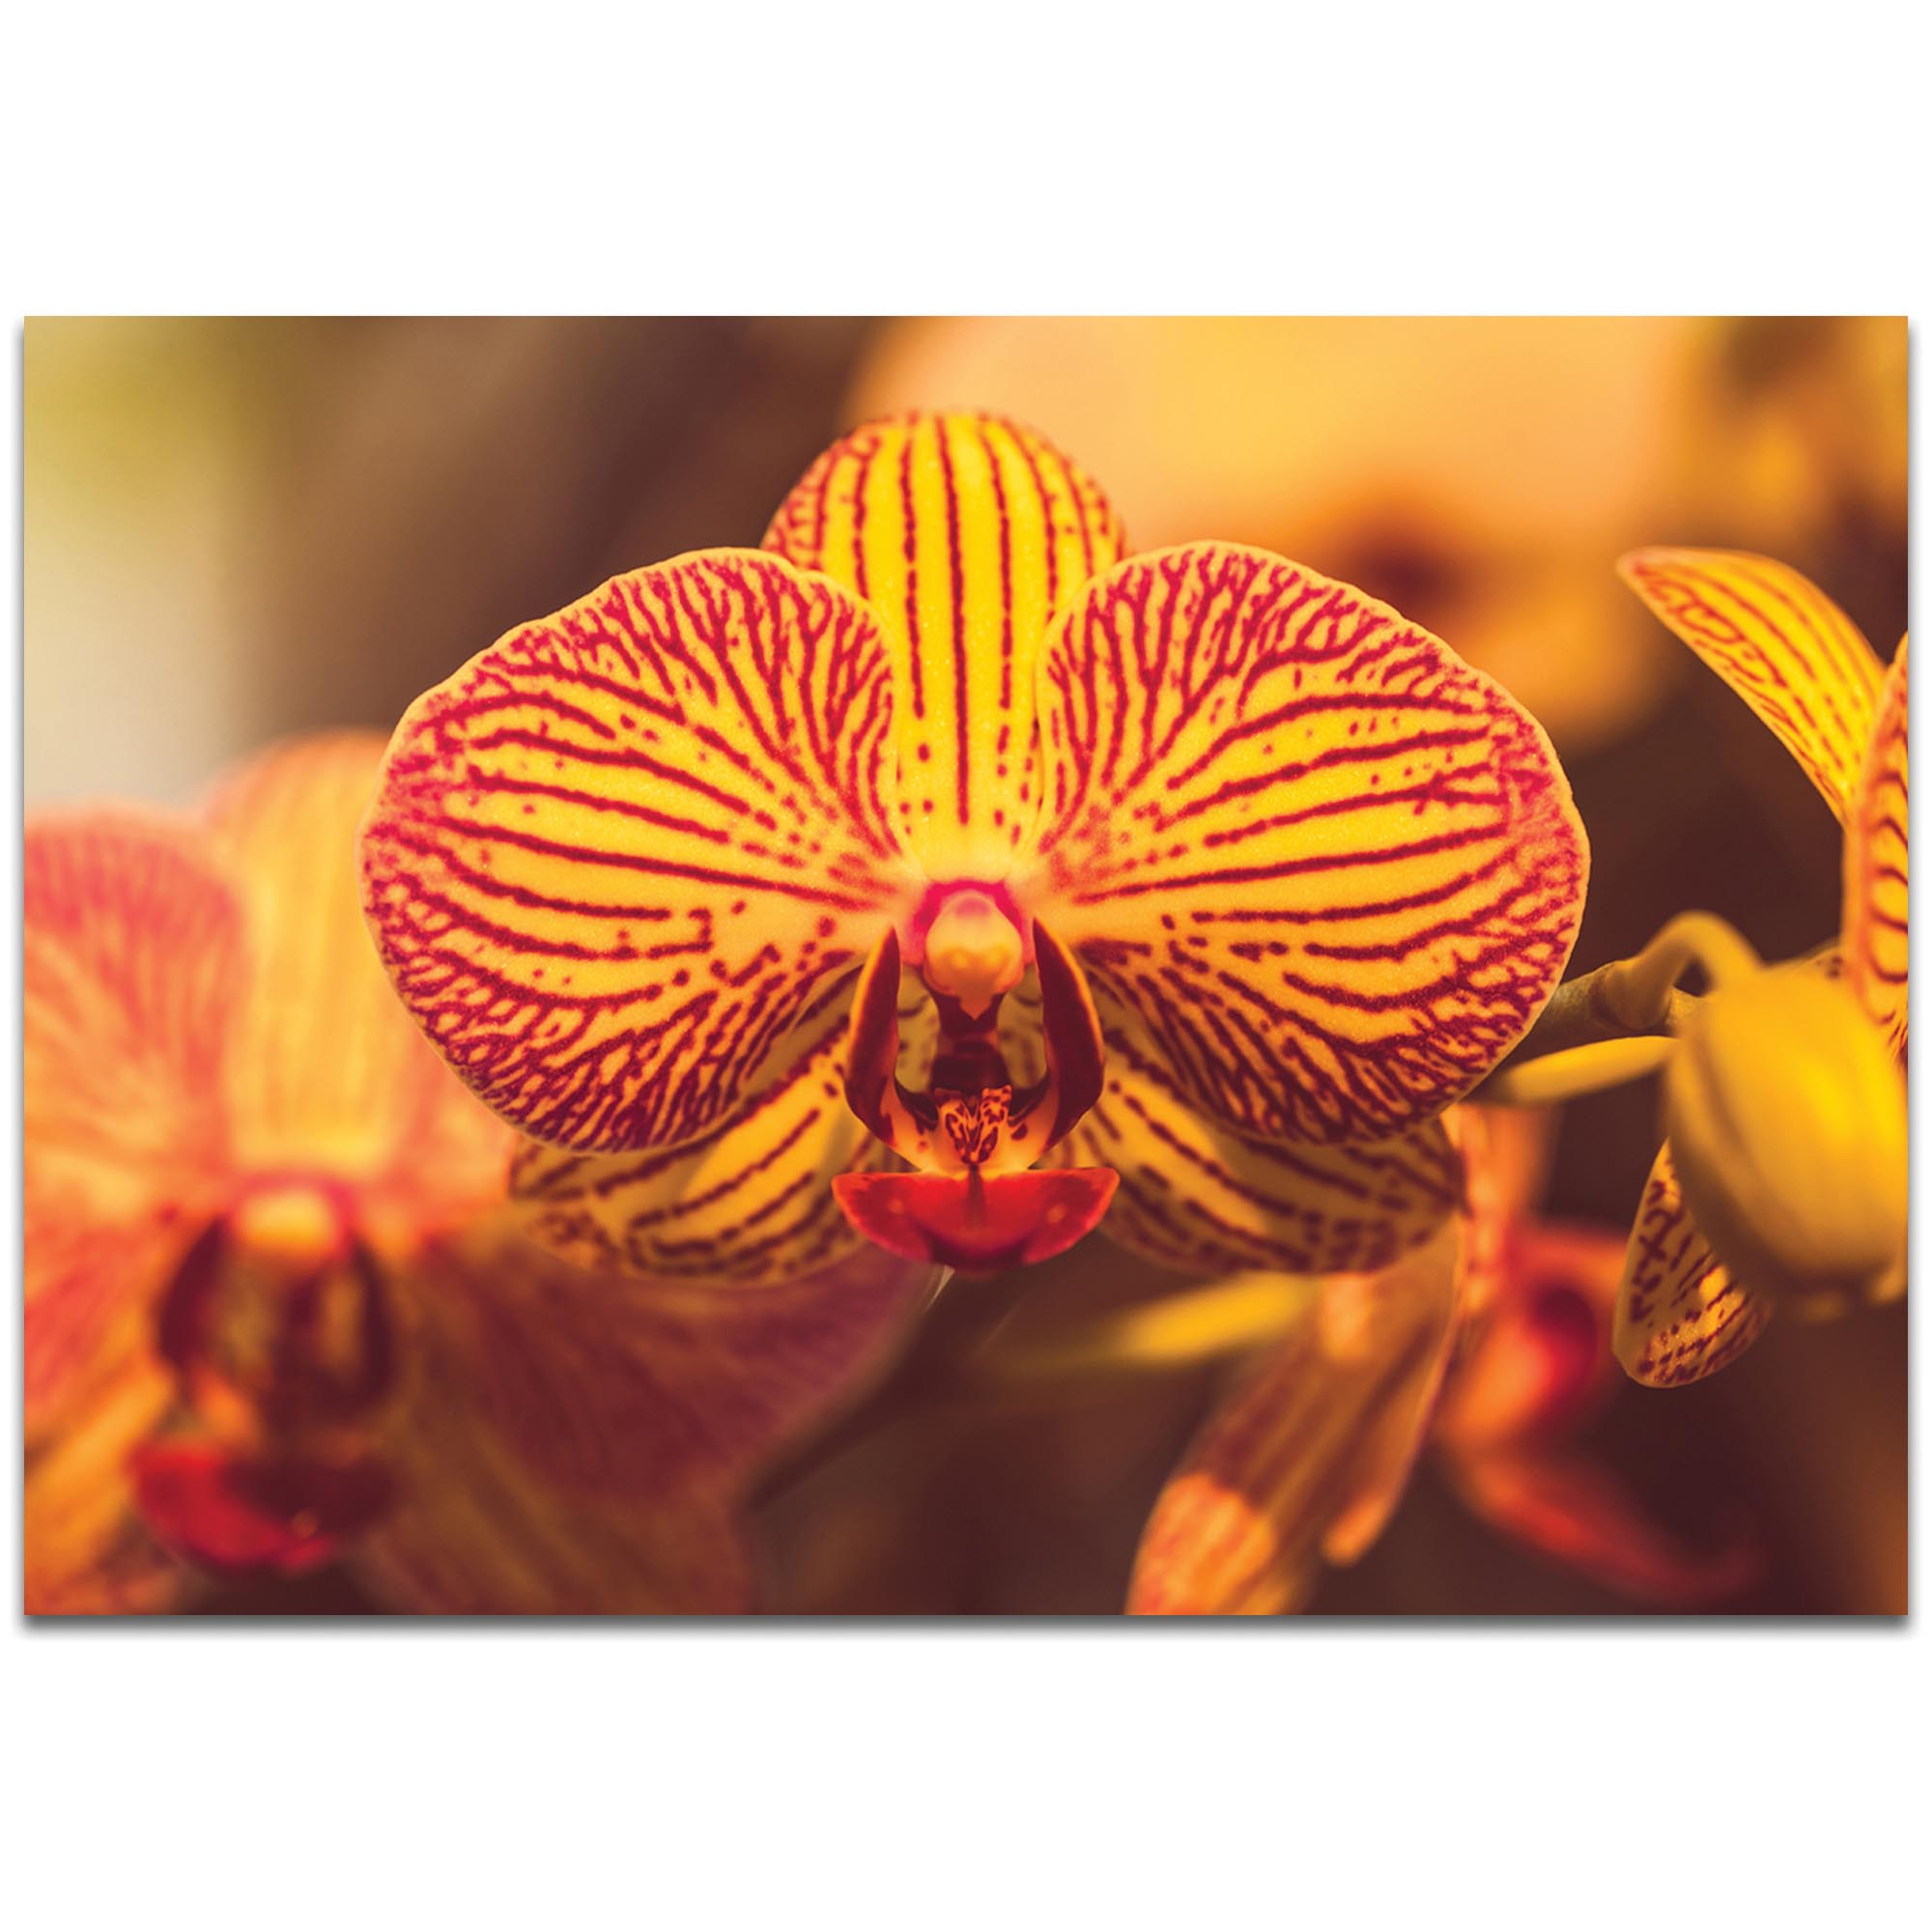 Nature Photography 'Sunset Bloom' - Flower Blossom Art on Metal or Plexiglass